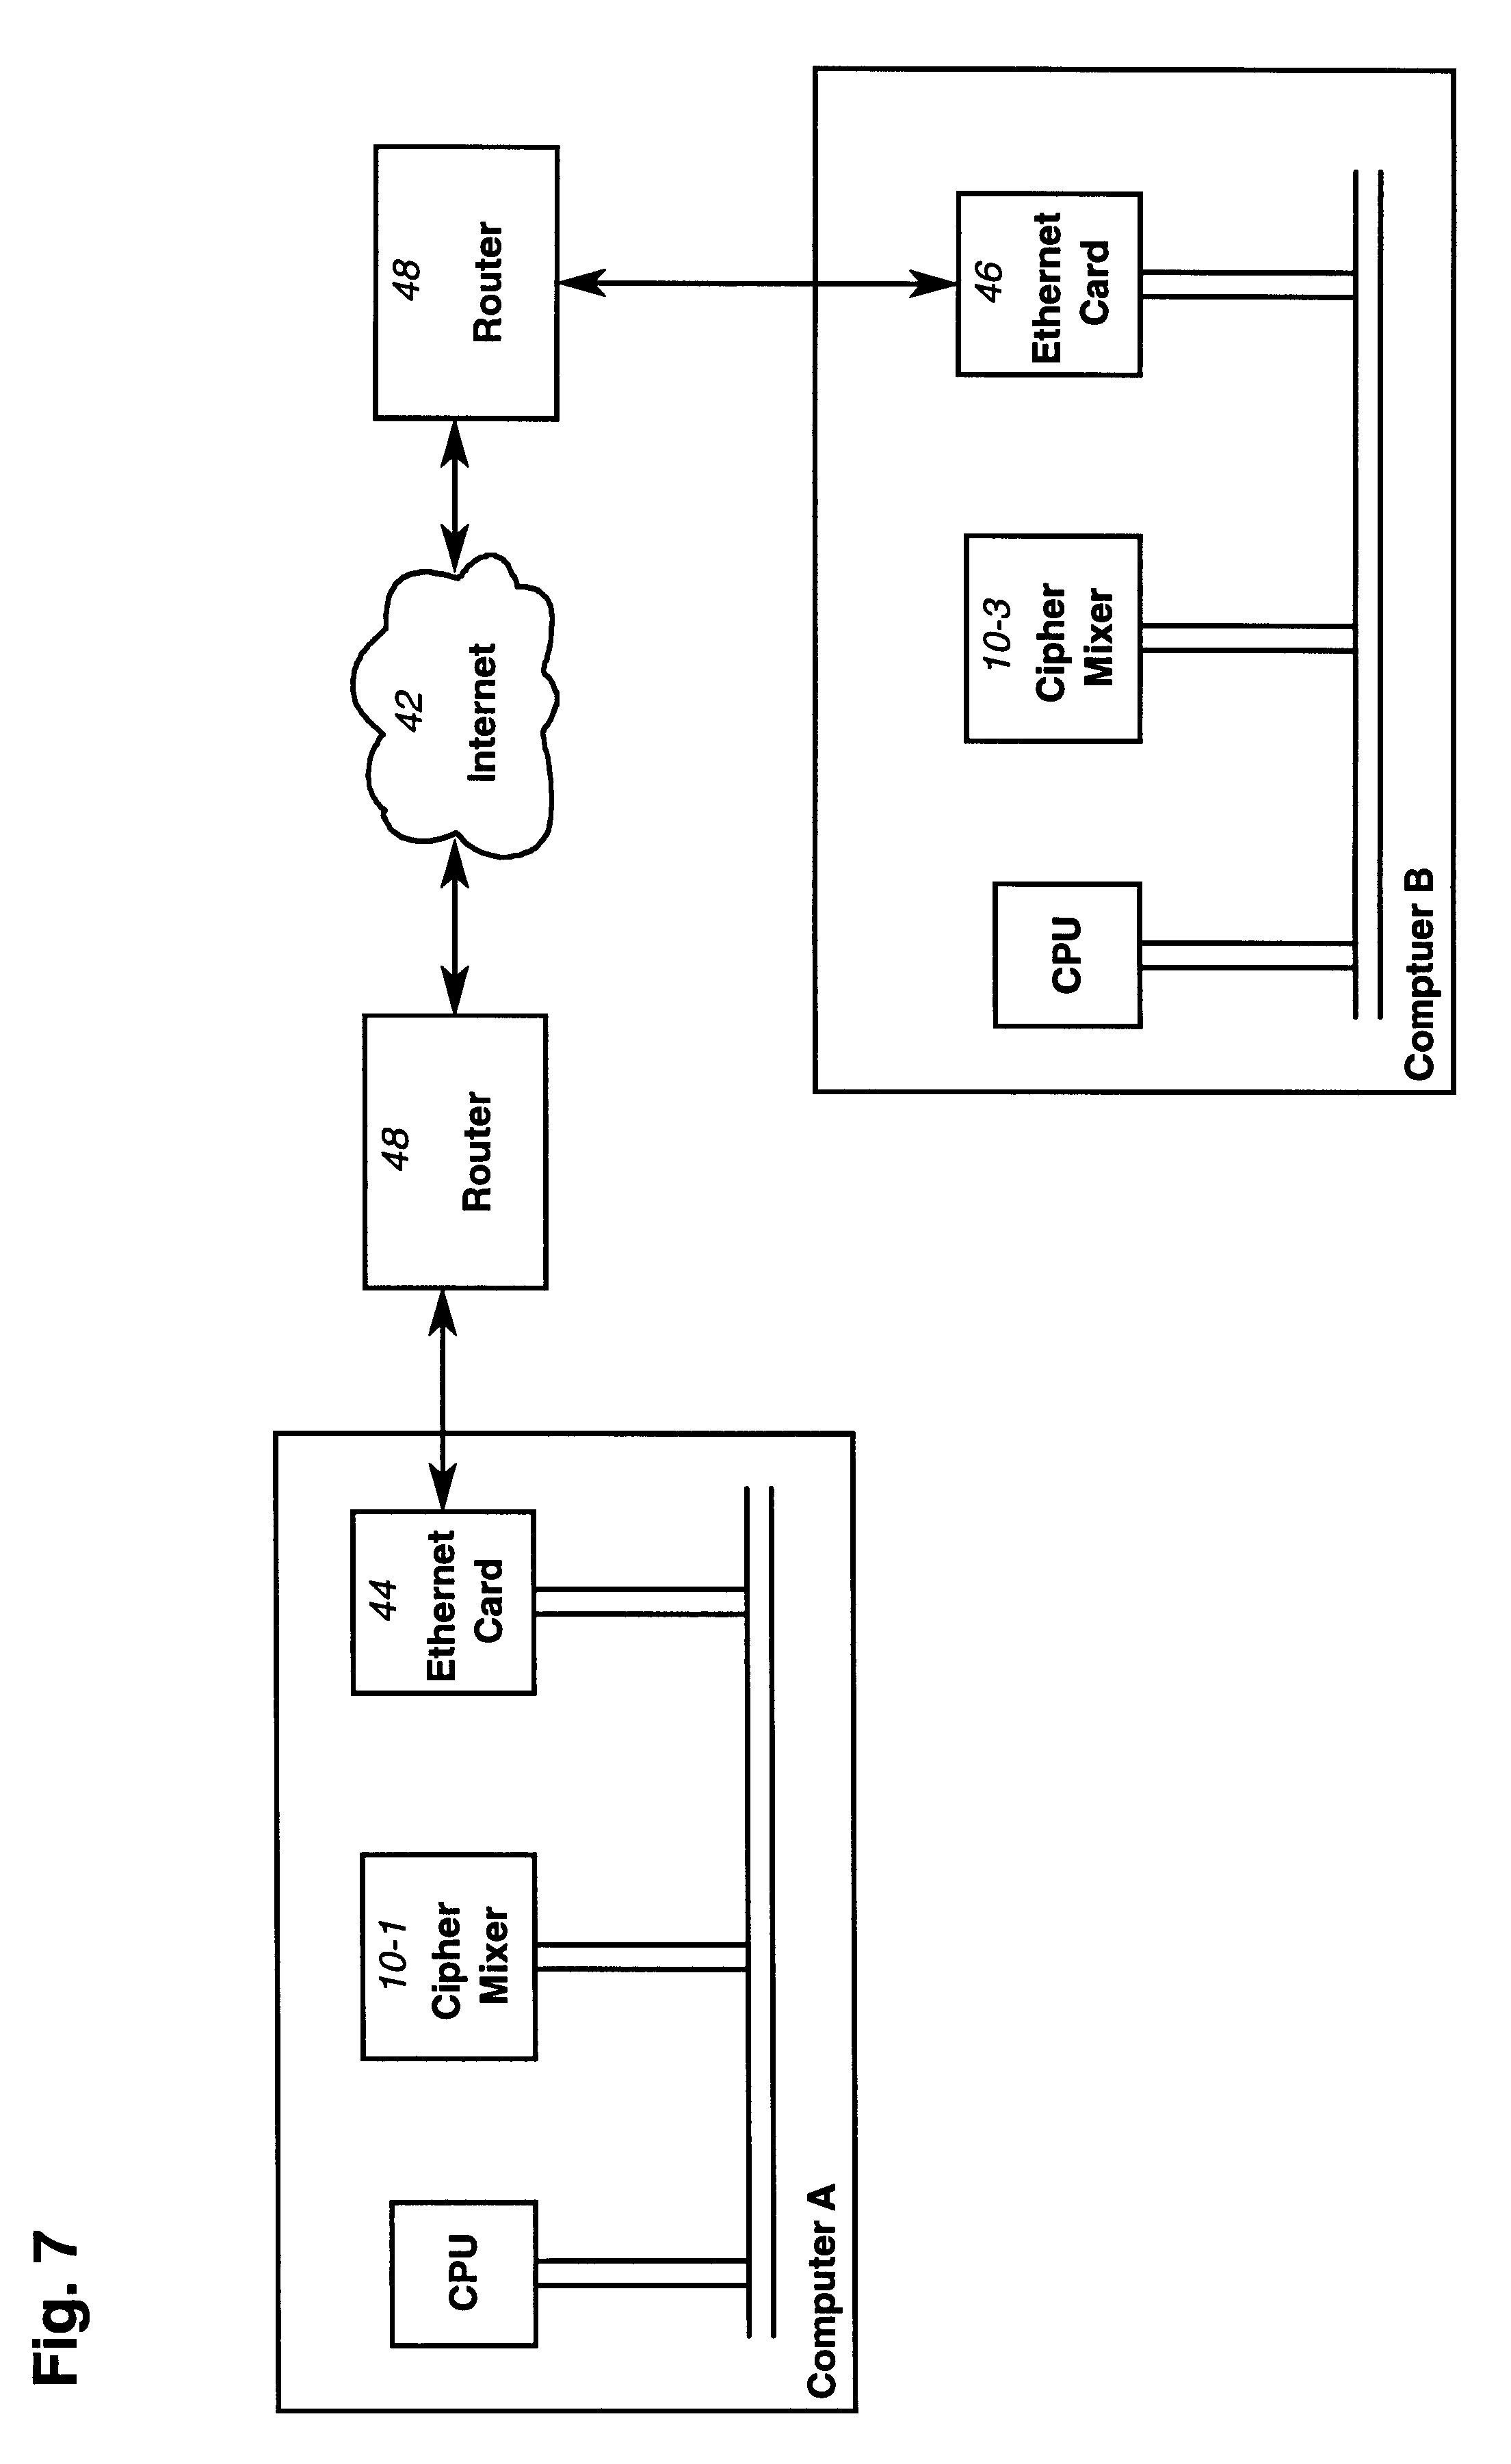 Random number mixer - Checkpoint ppc login